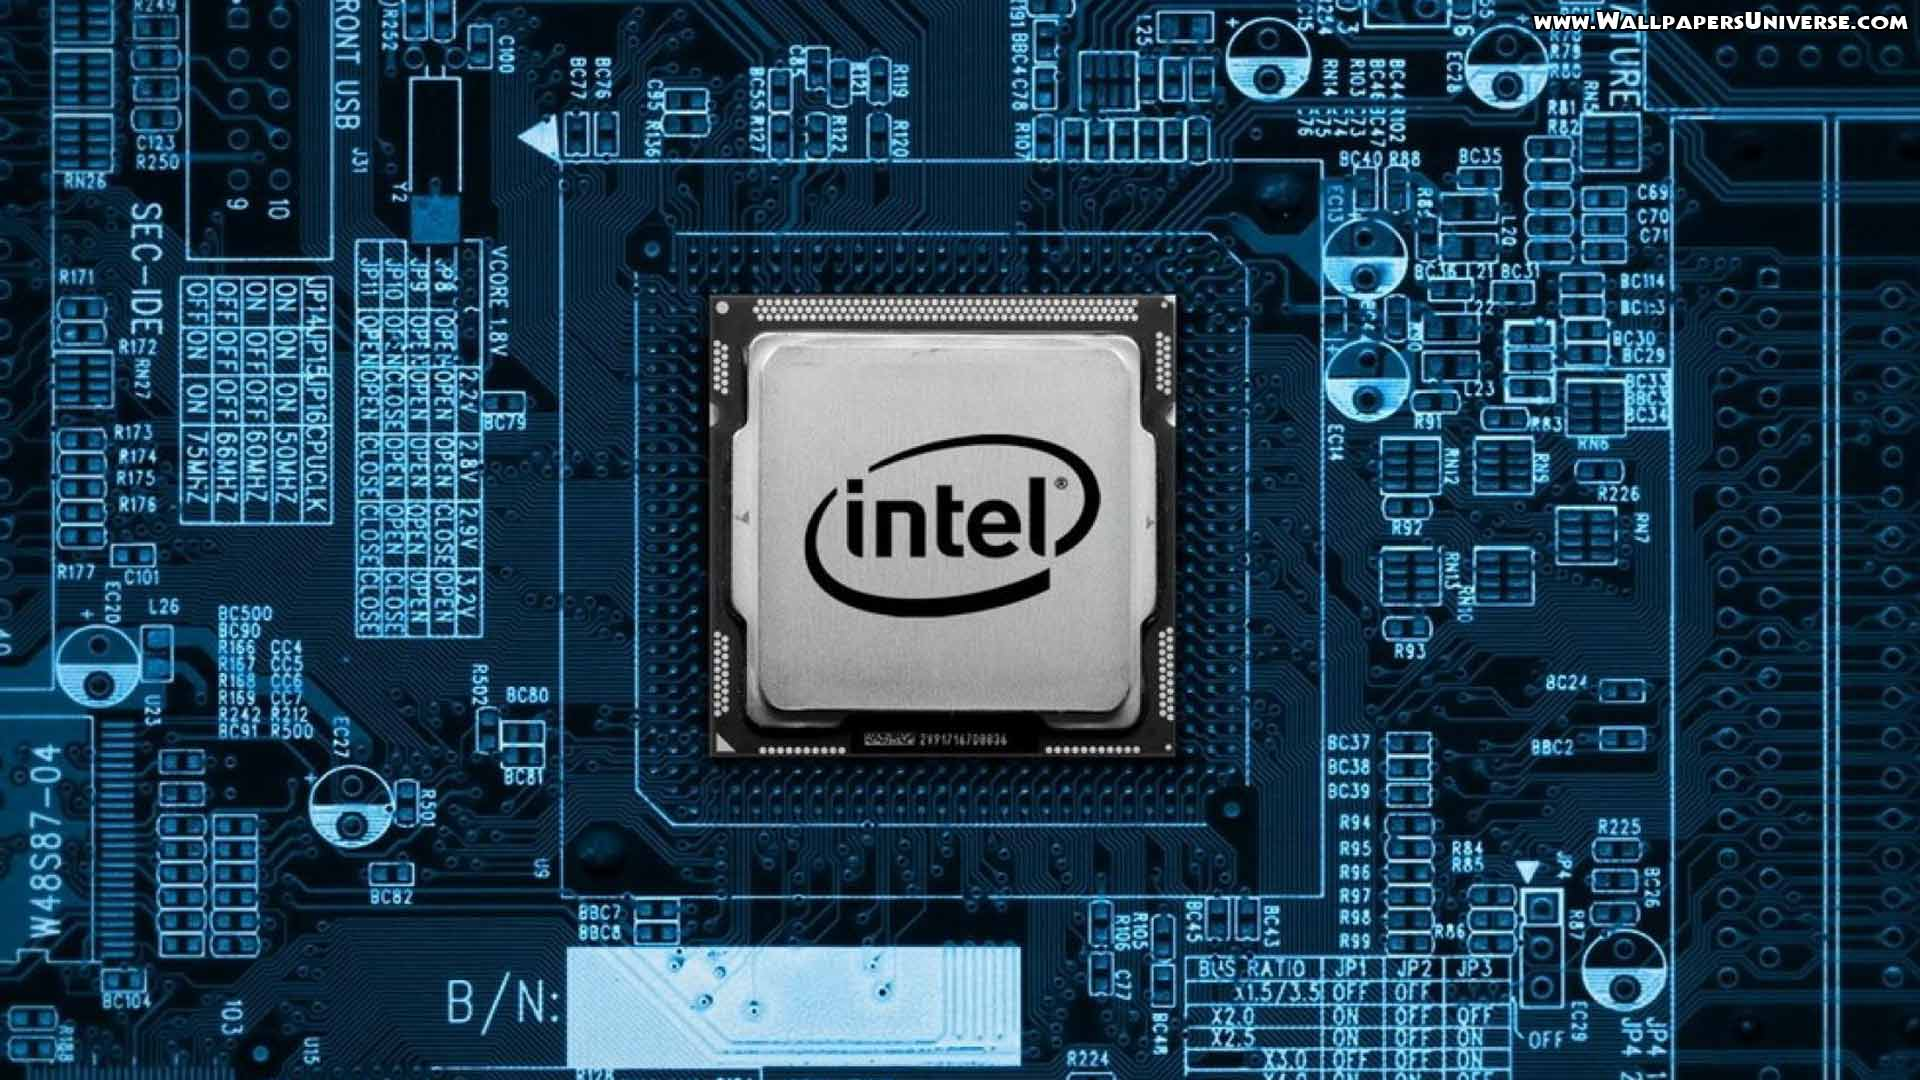 Intel release 10 core Comet Lake CPUs for desktops in 2020